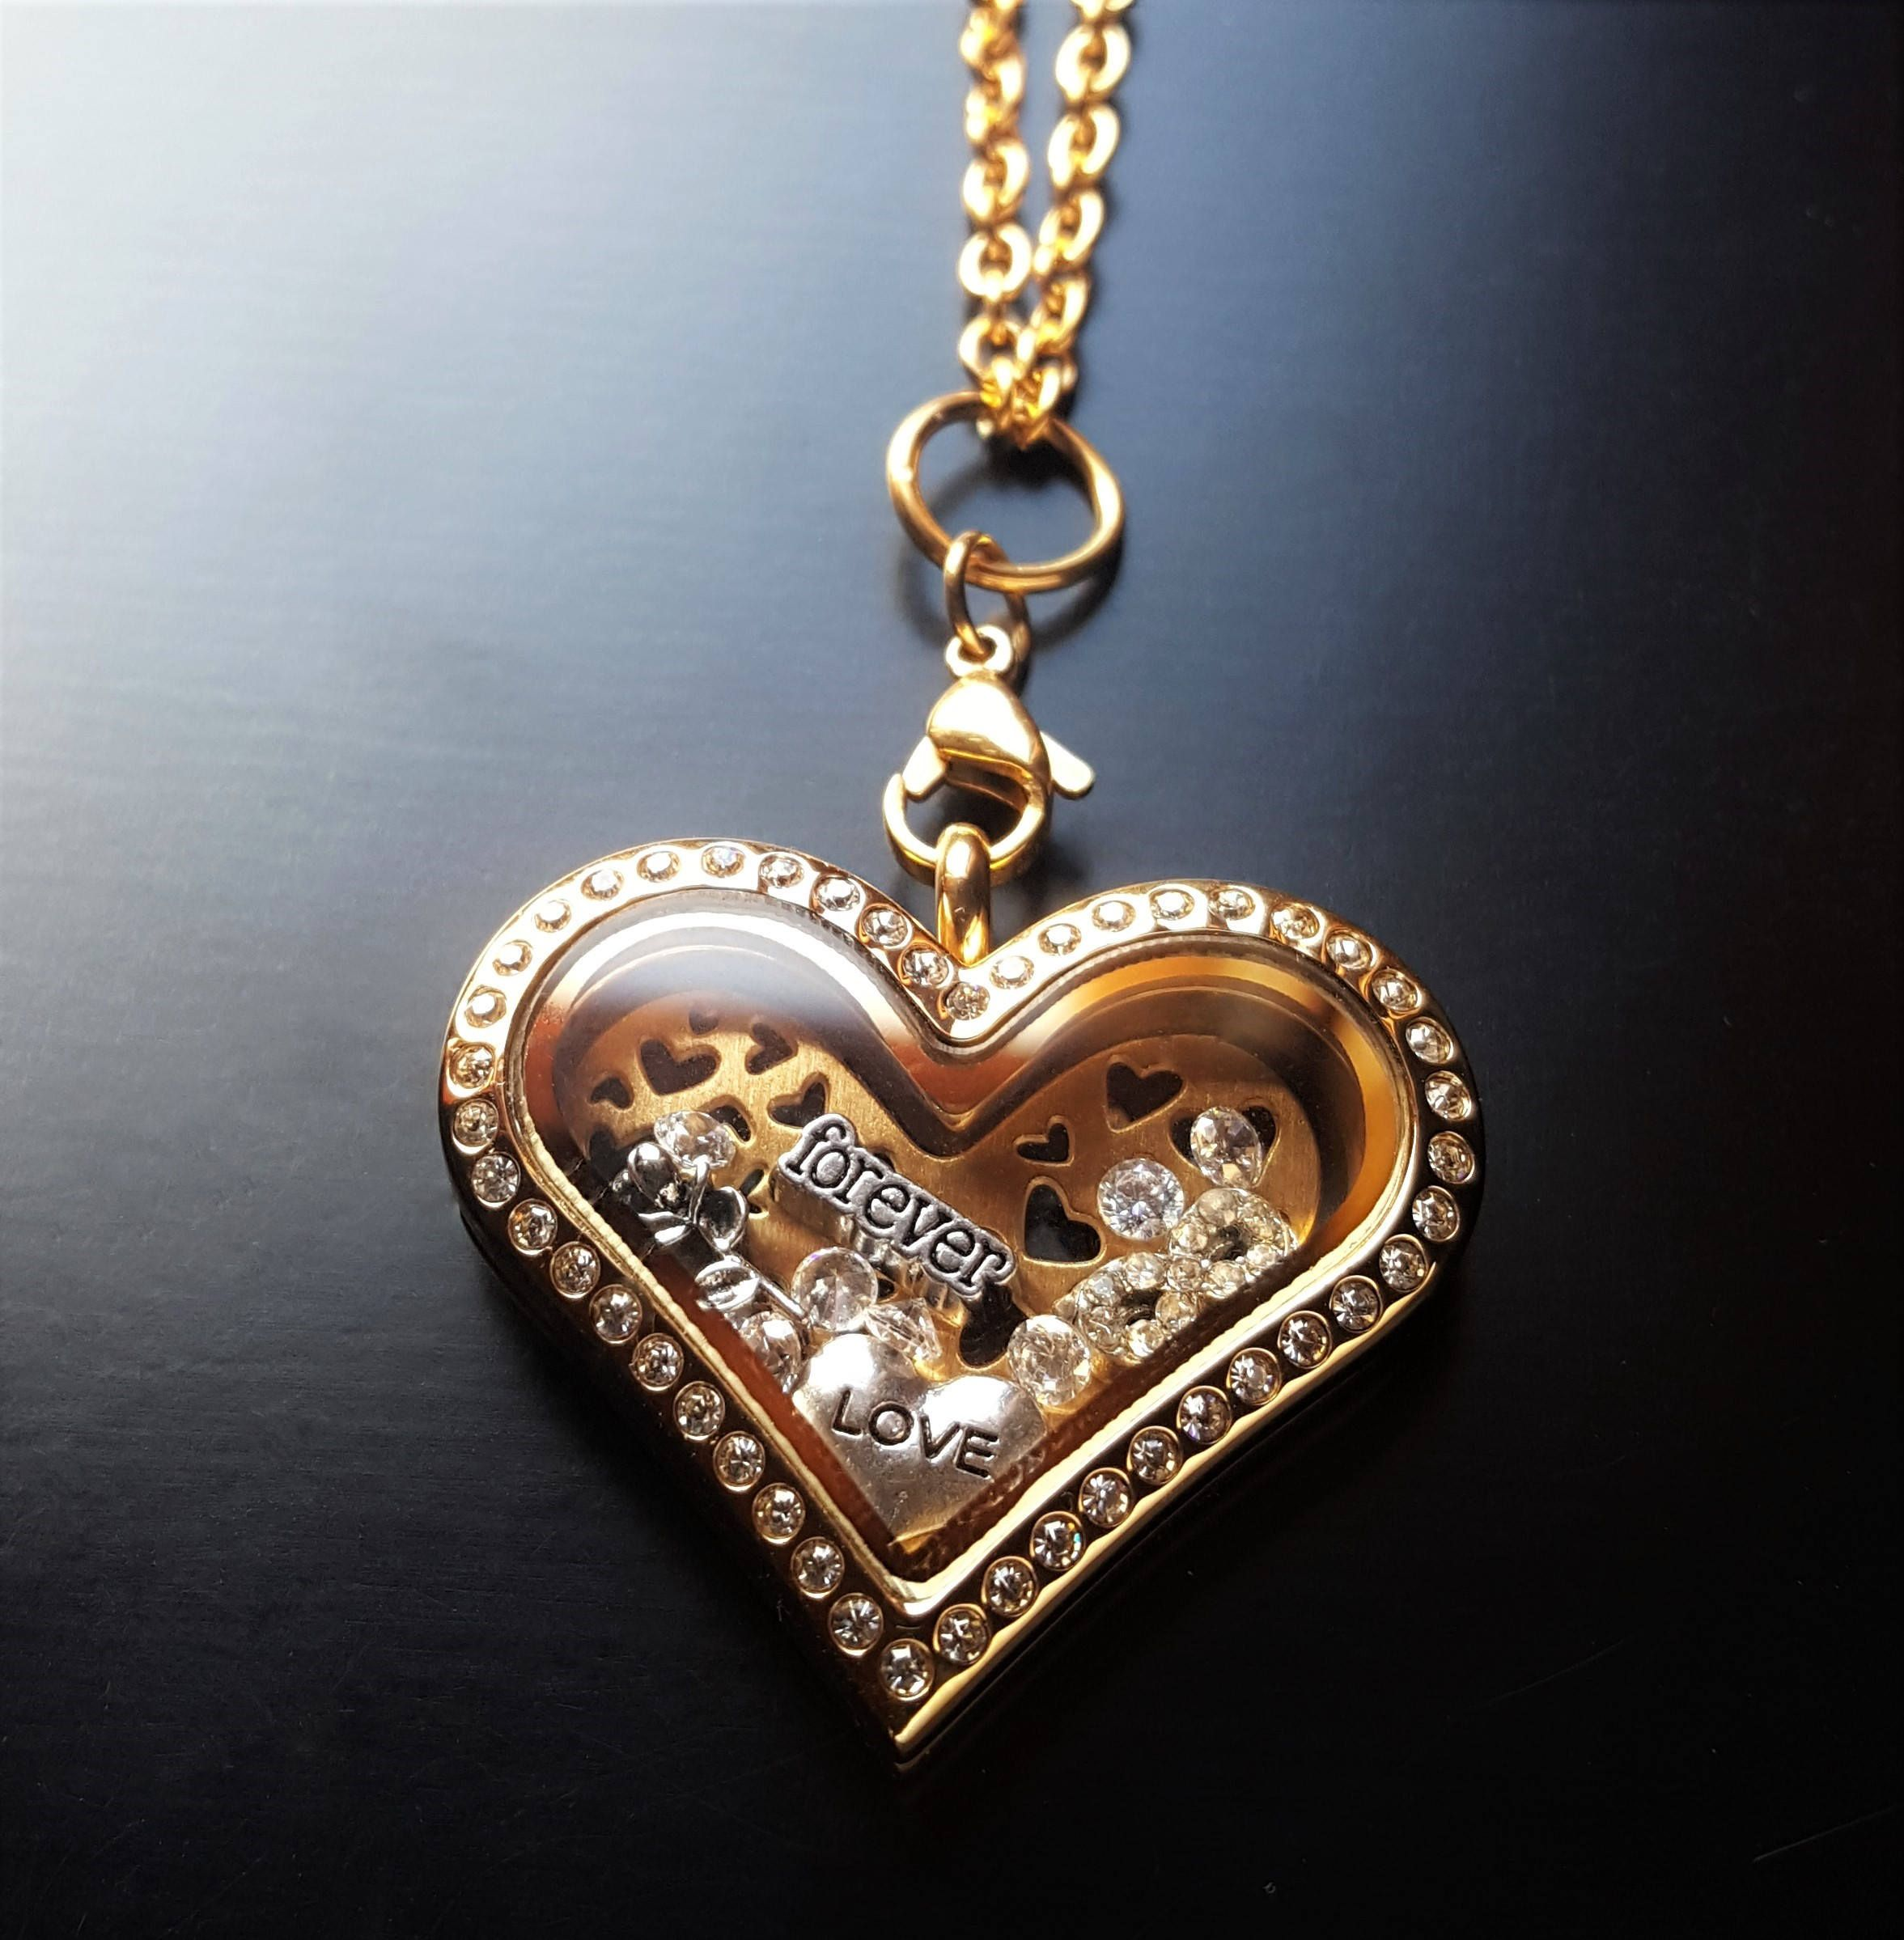 'Love' Floating Locket Charm